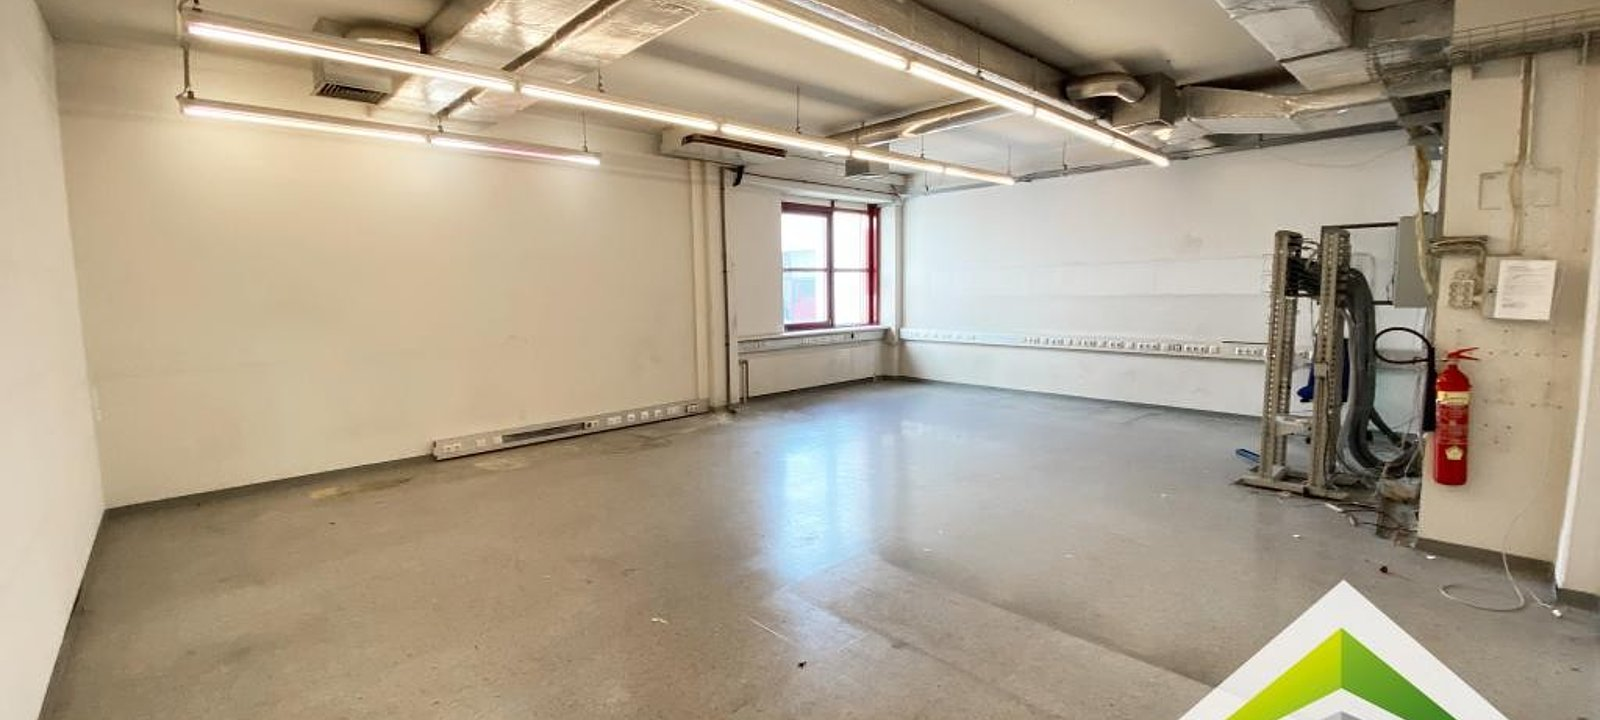 Atelier Raum